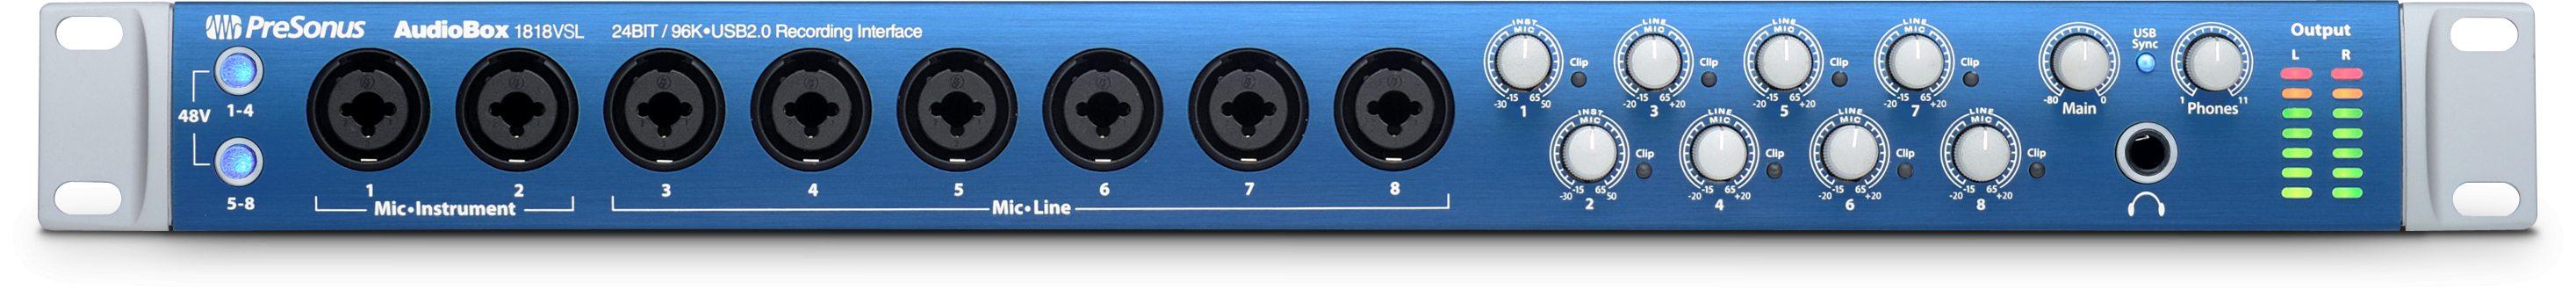 Image of   Presonus AudioBox 1818 VSL